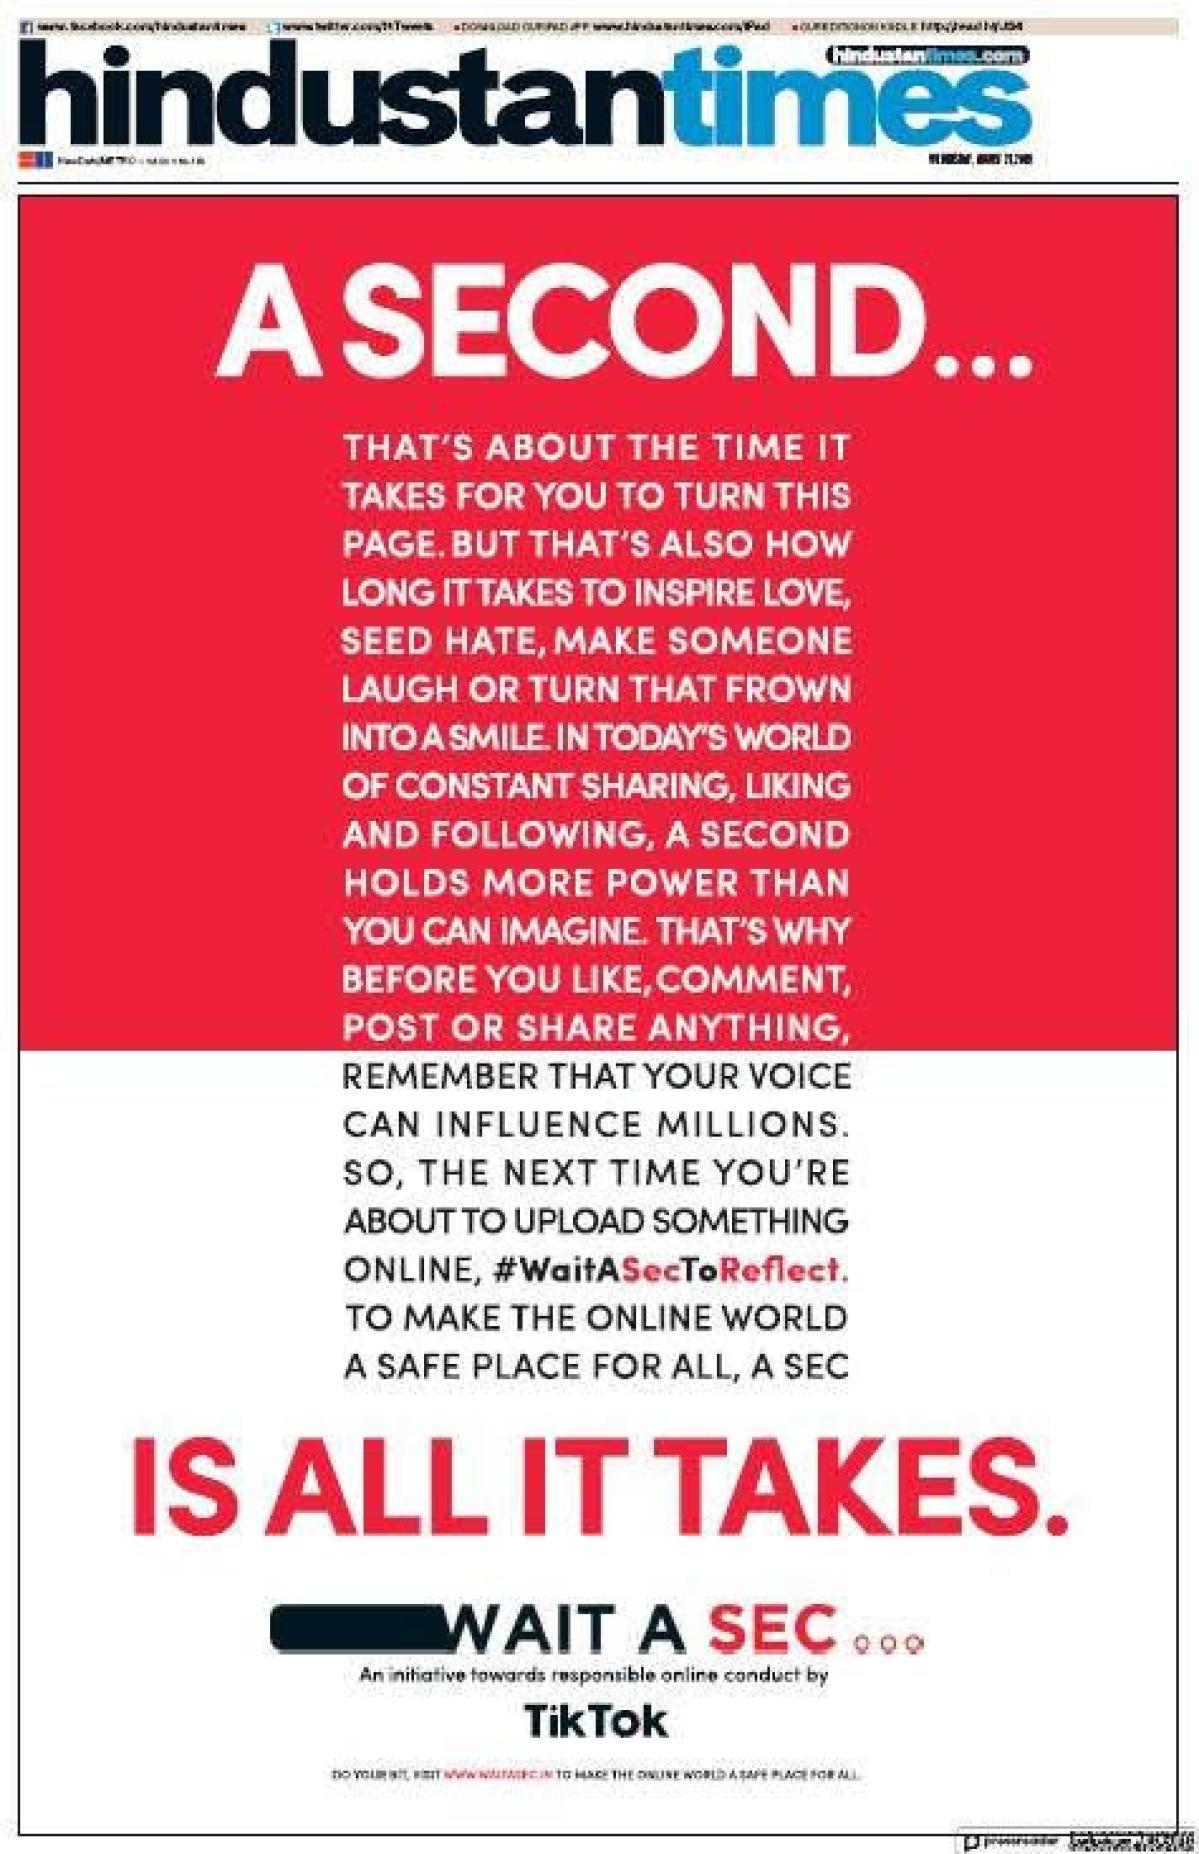 The recent print ad